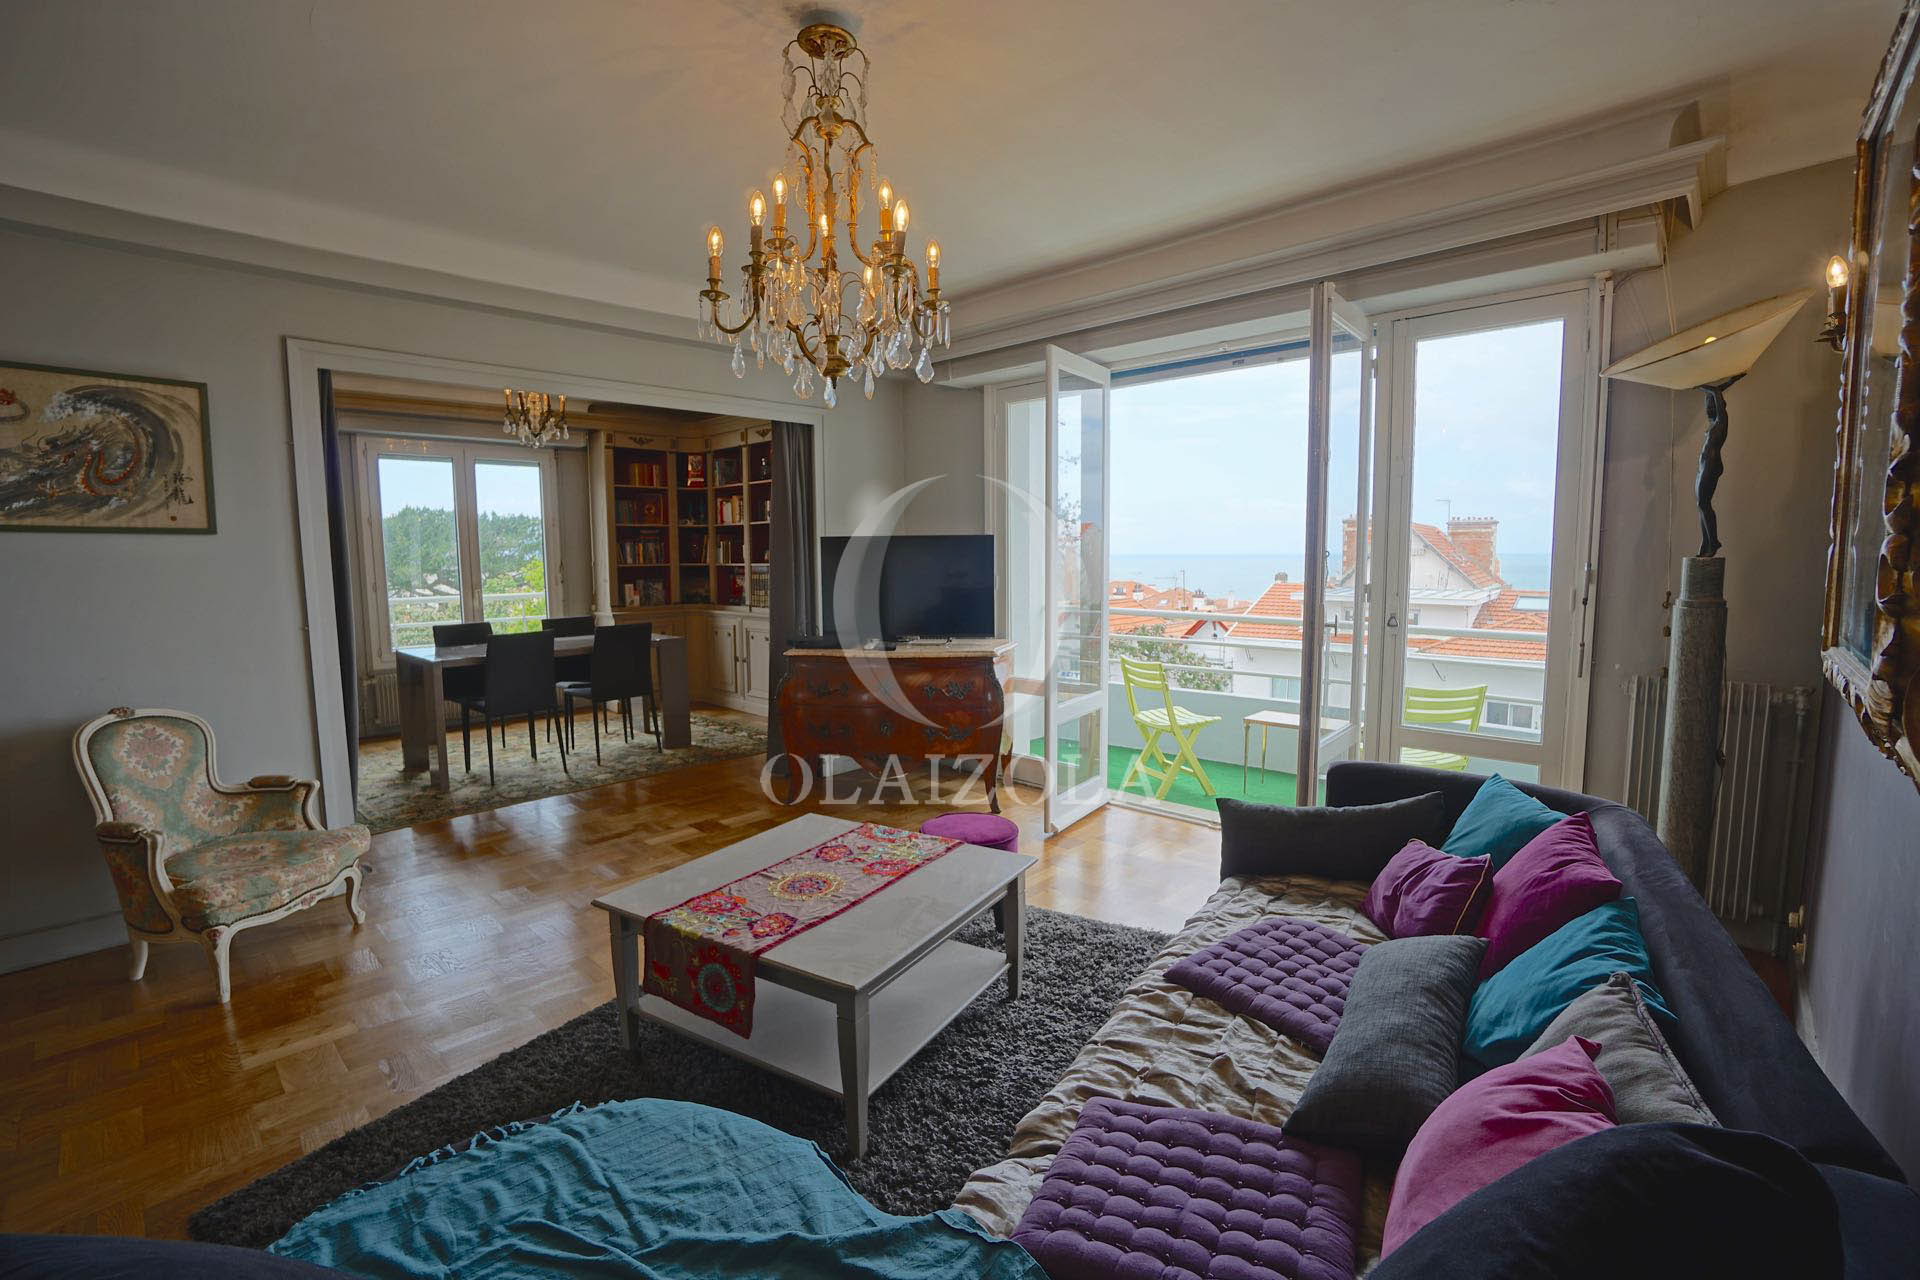 espace tout confort agence olaizola location. Black Bedroom Furniture Sets. Home Design Ideas